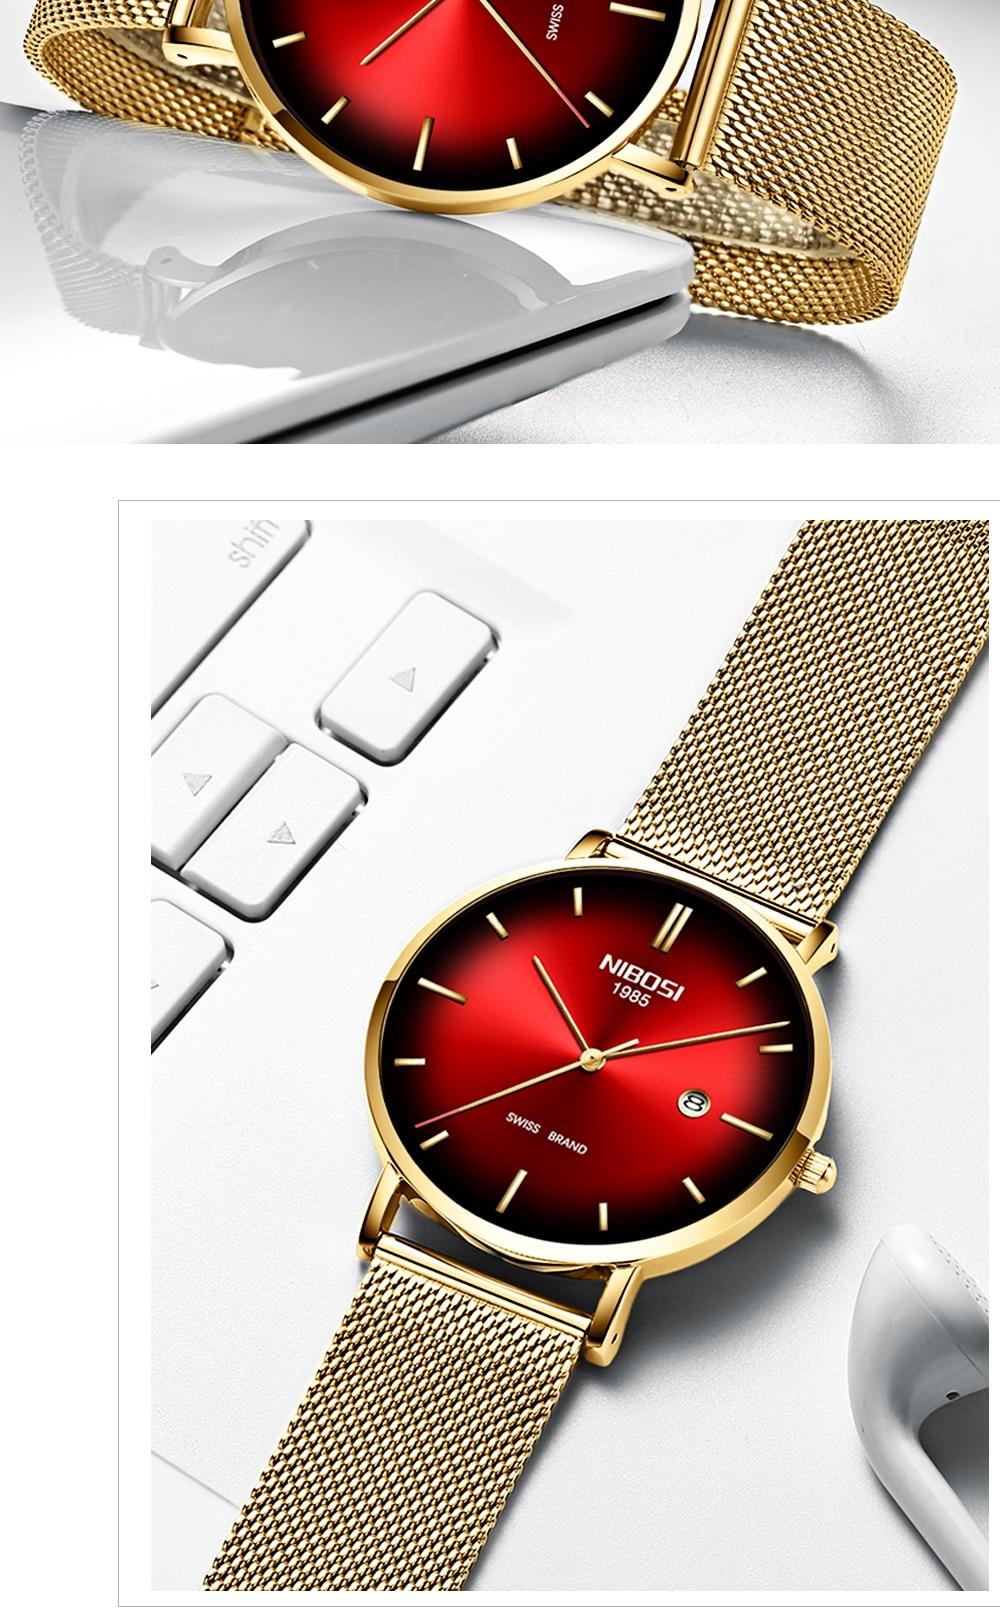 HTB1RjLVaznuK1RkSmFPq6AuzFXal NIBOSI Watch Men Simple Fashion Swiss Brand Quartz Watch Luxury Creative Waterproof Date Casual Men Watches Relogio Masculino